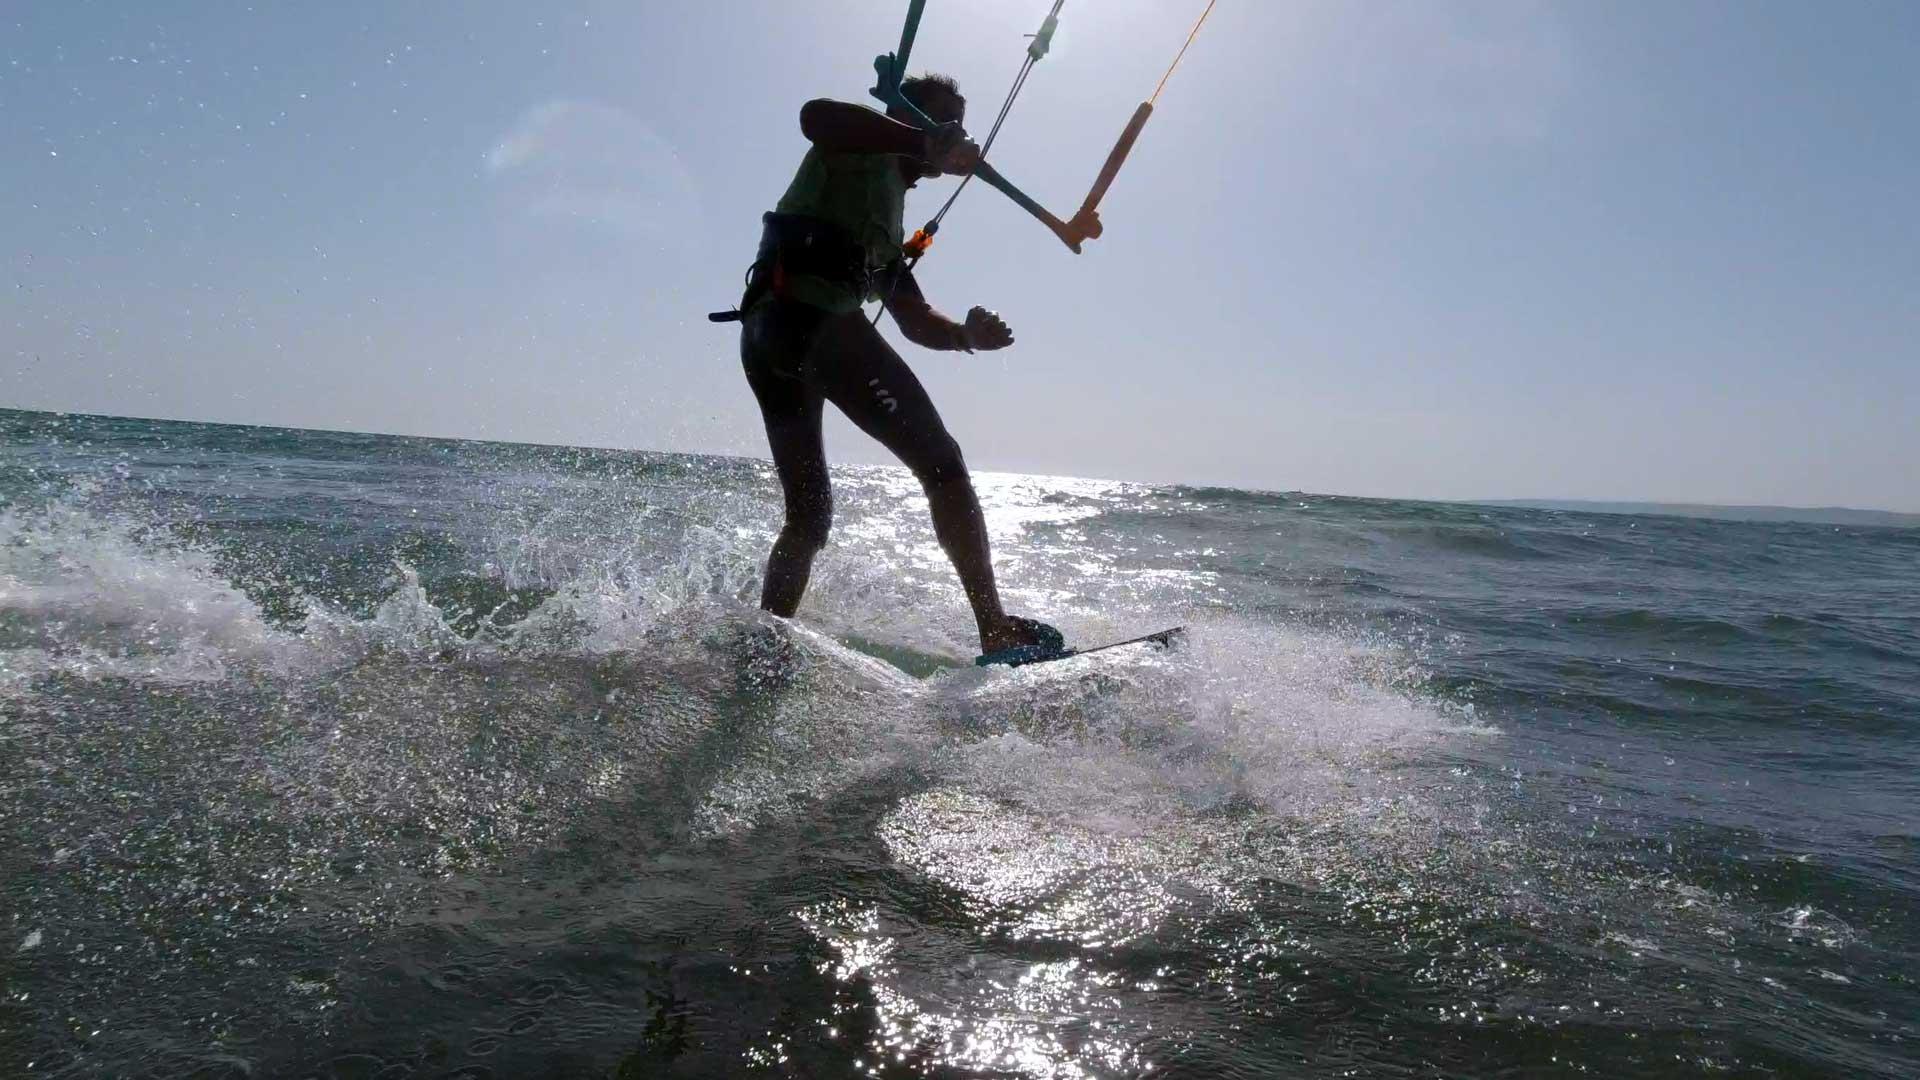 Cambio mura tavola twin tip kitesurf tutorial strambata